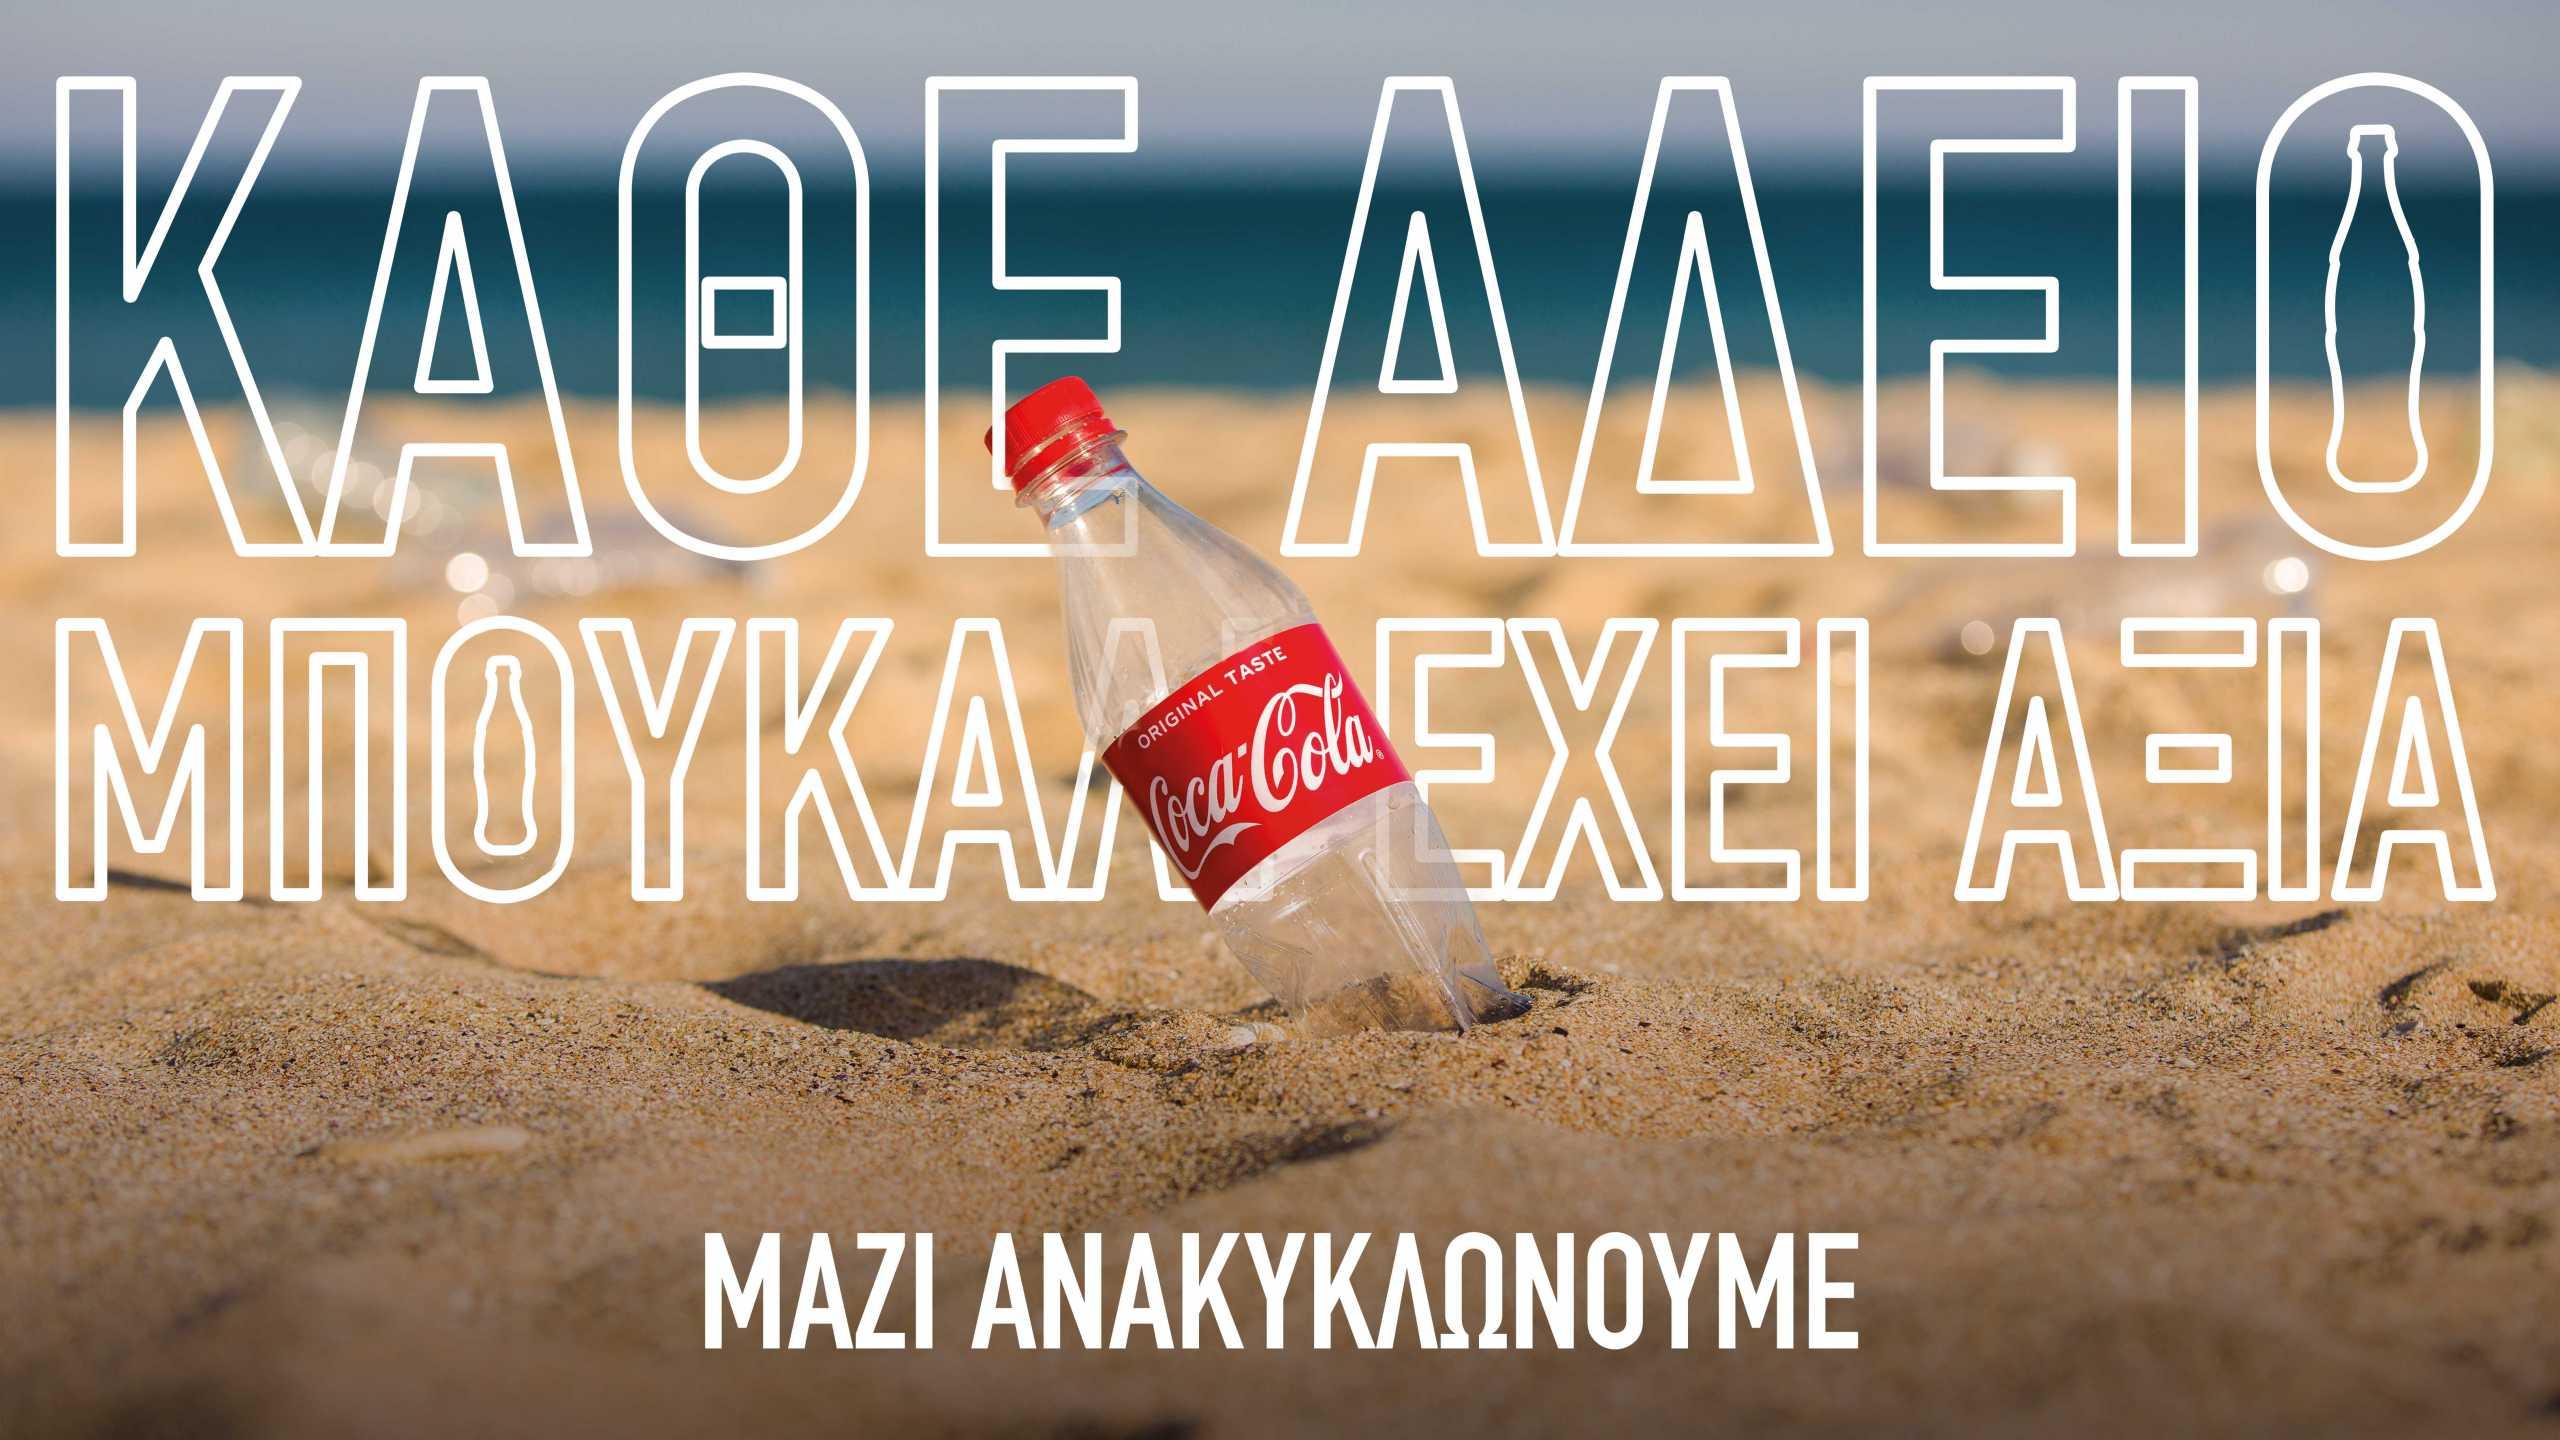 Coca-Cola: Στηρίζει την εθνική προσπάθεια για Ανακύκλωση